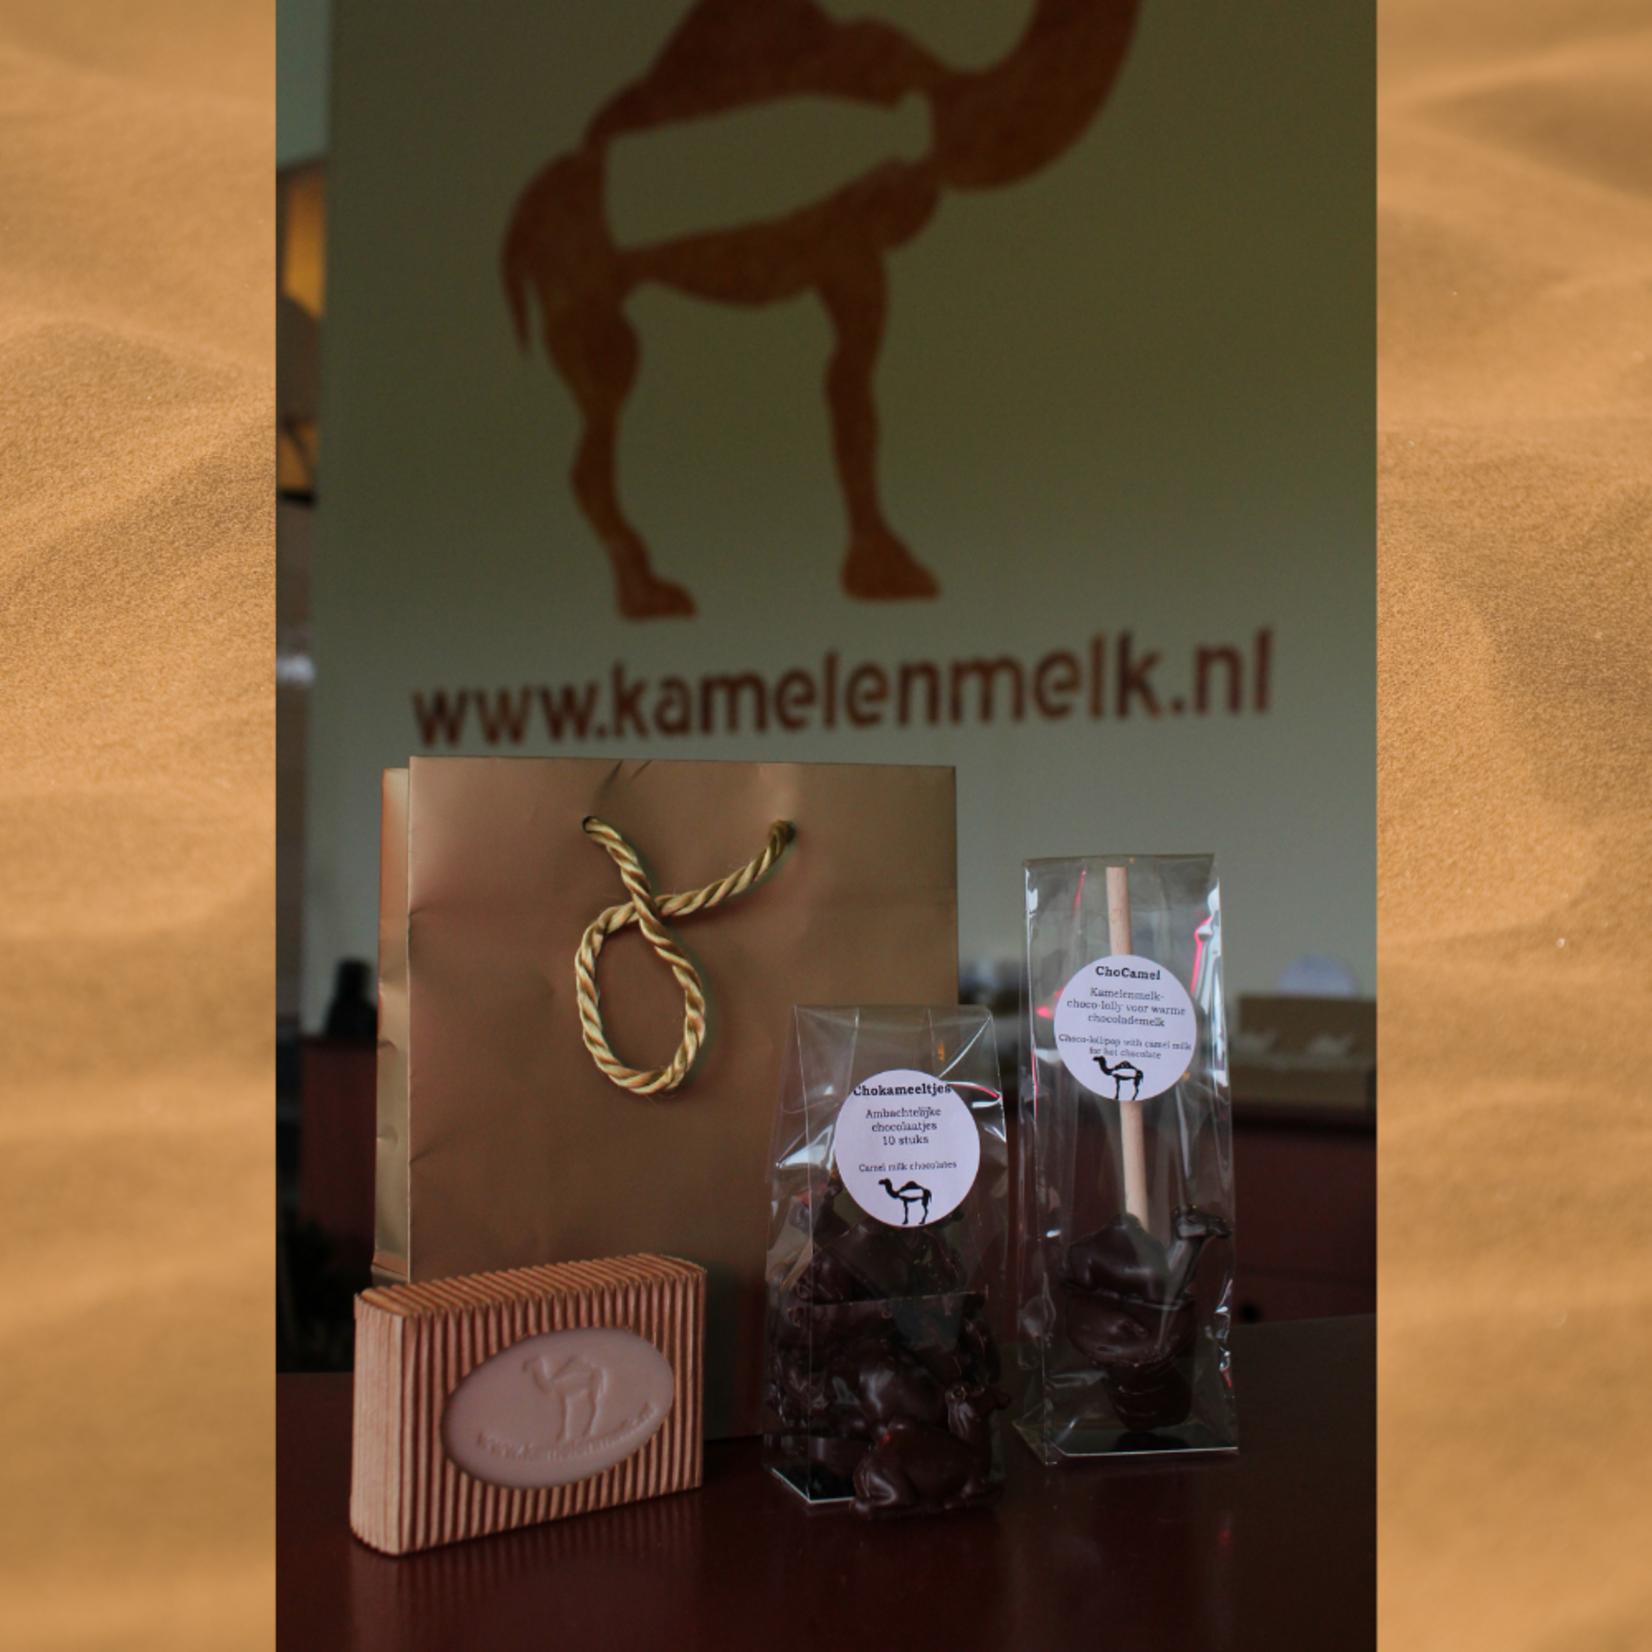 Kamelen cadeau pakket 1 met kamelenzeep, chokameeltjes en een Chocamel-lolly